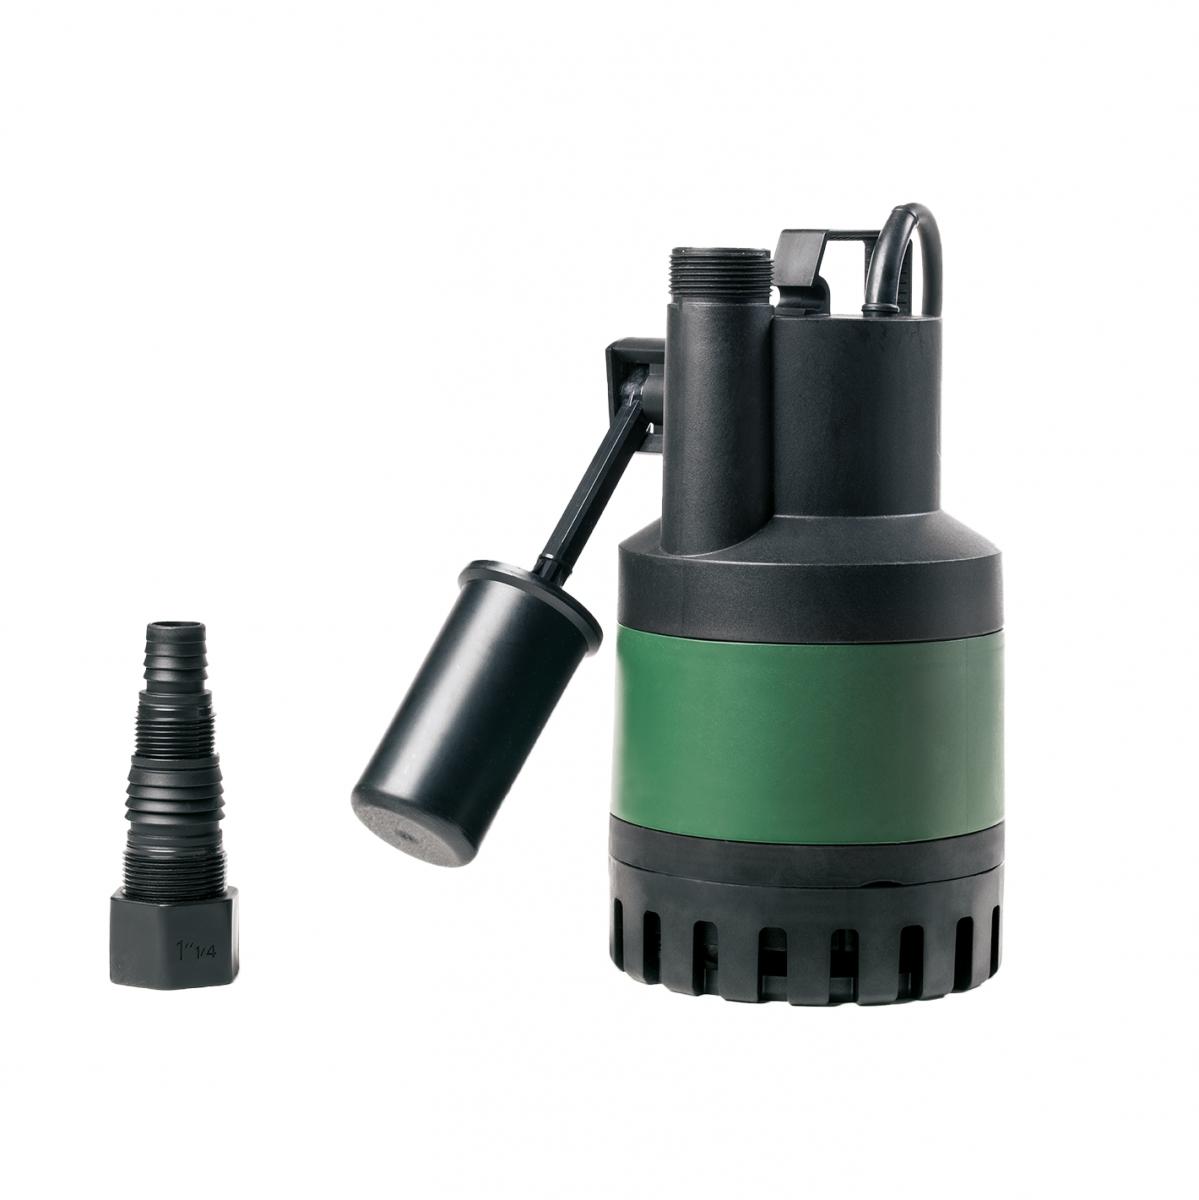 Tauchpumpe NOVA UP 300 M-AE 230V, P1 – 0,38kW, P2 – 0,21kW Tauchpumpe NOVA UP 300 M-AE 230V, P1 – 0,38kW, P2 – 0,21kW